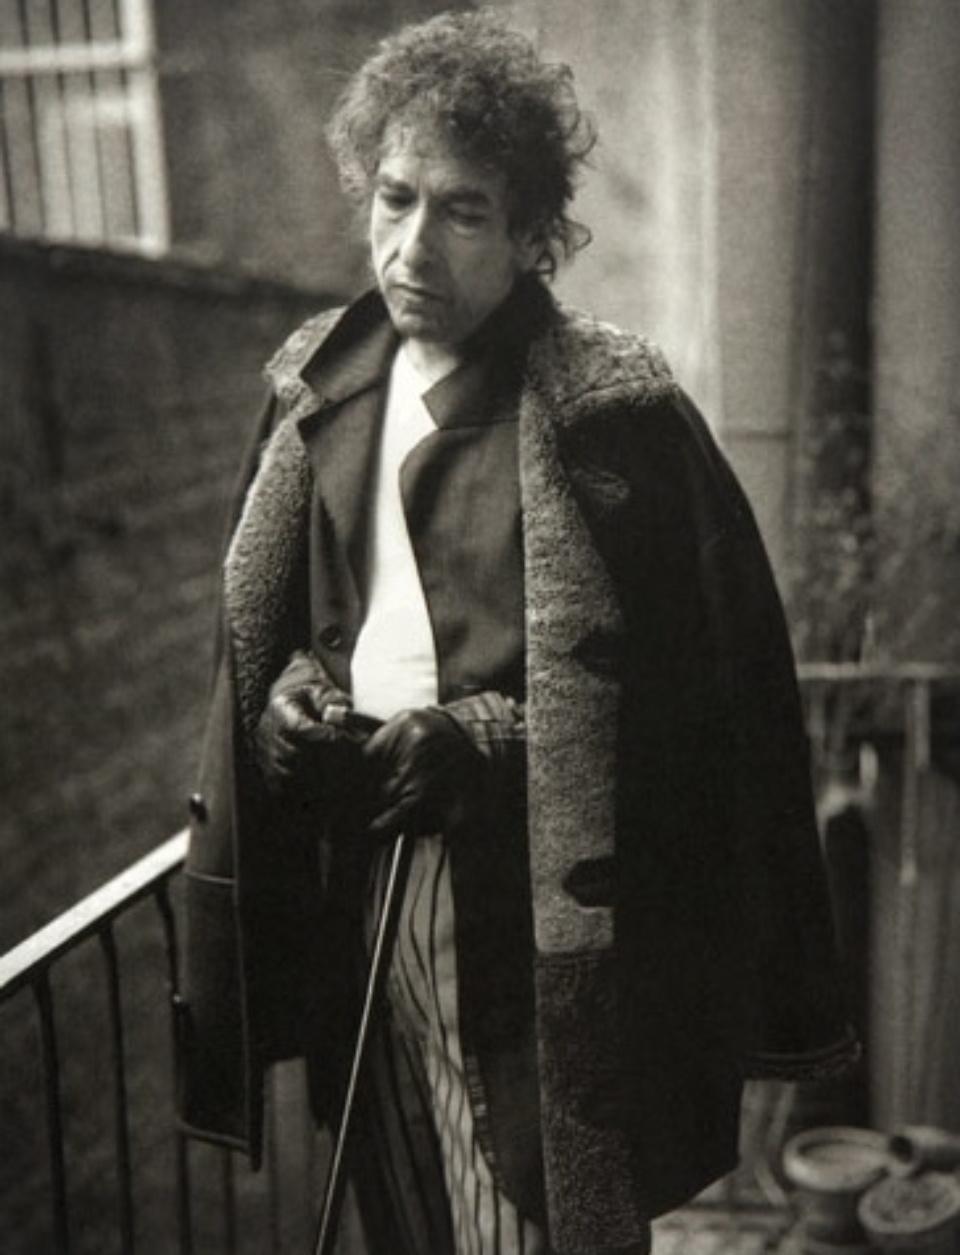 Mark Seliger: Bob Dylan New York, 1995 Platinum Print